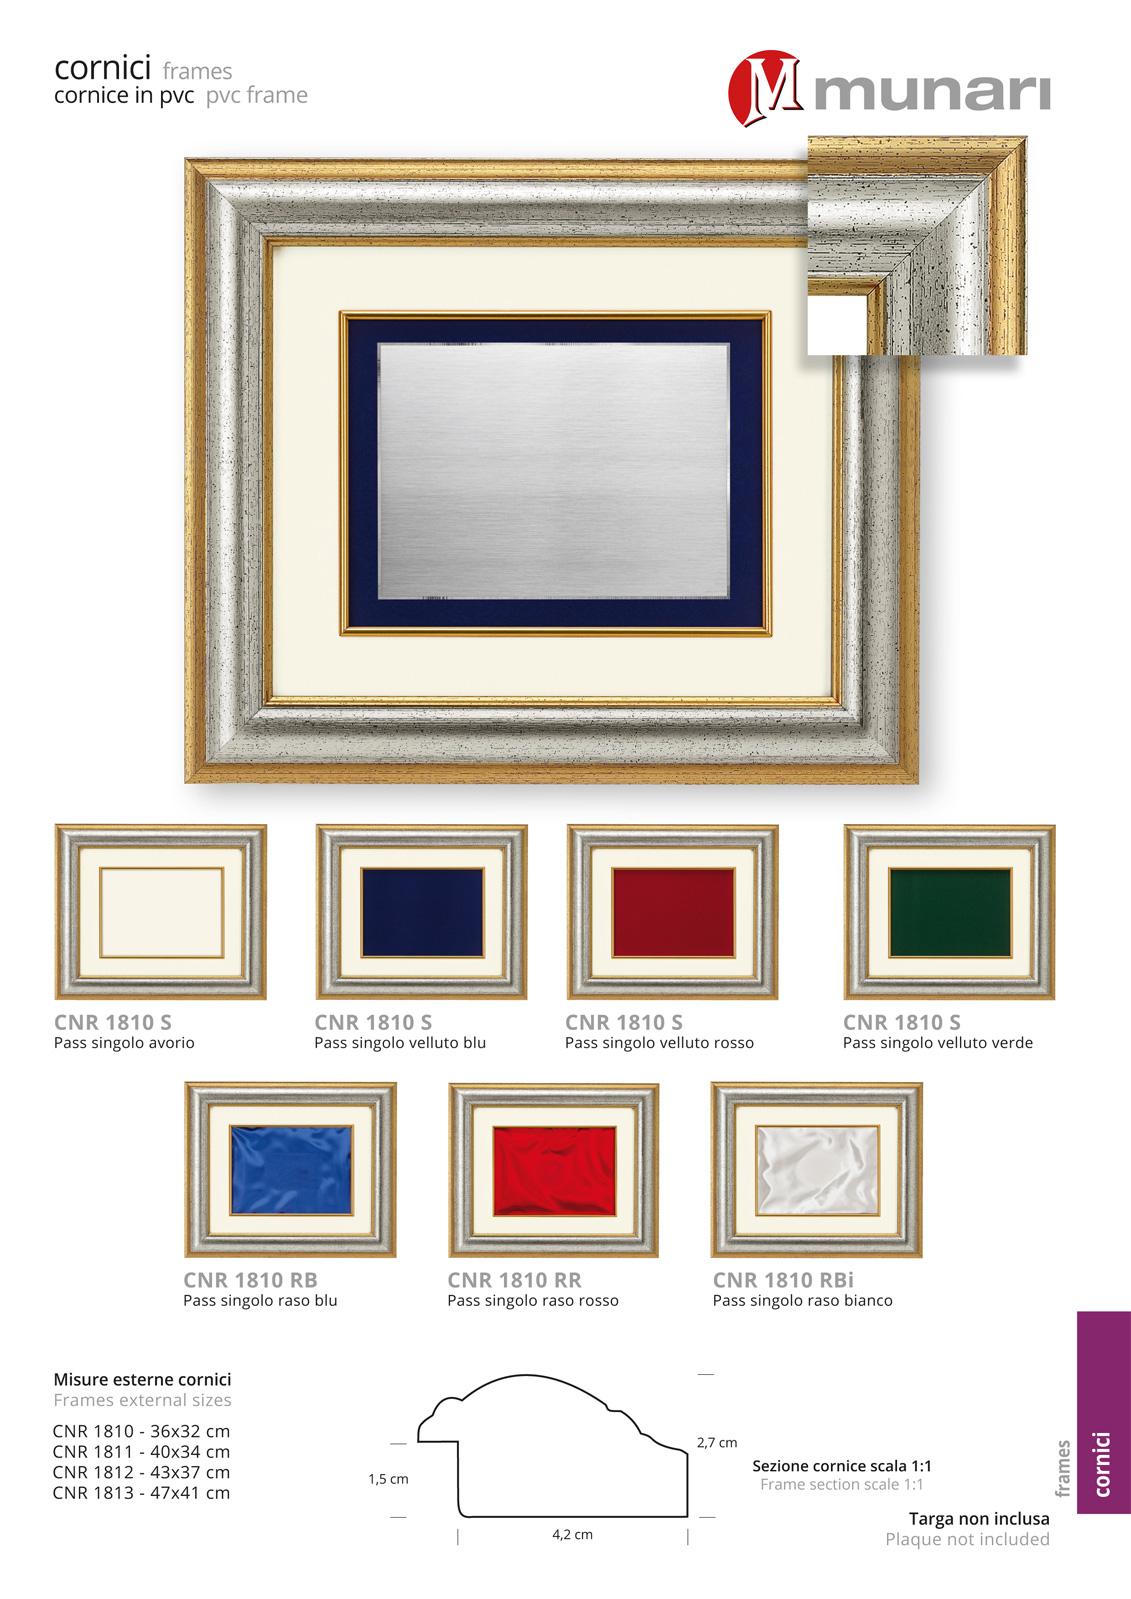 PVC frames series CNR 1810